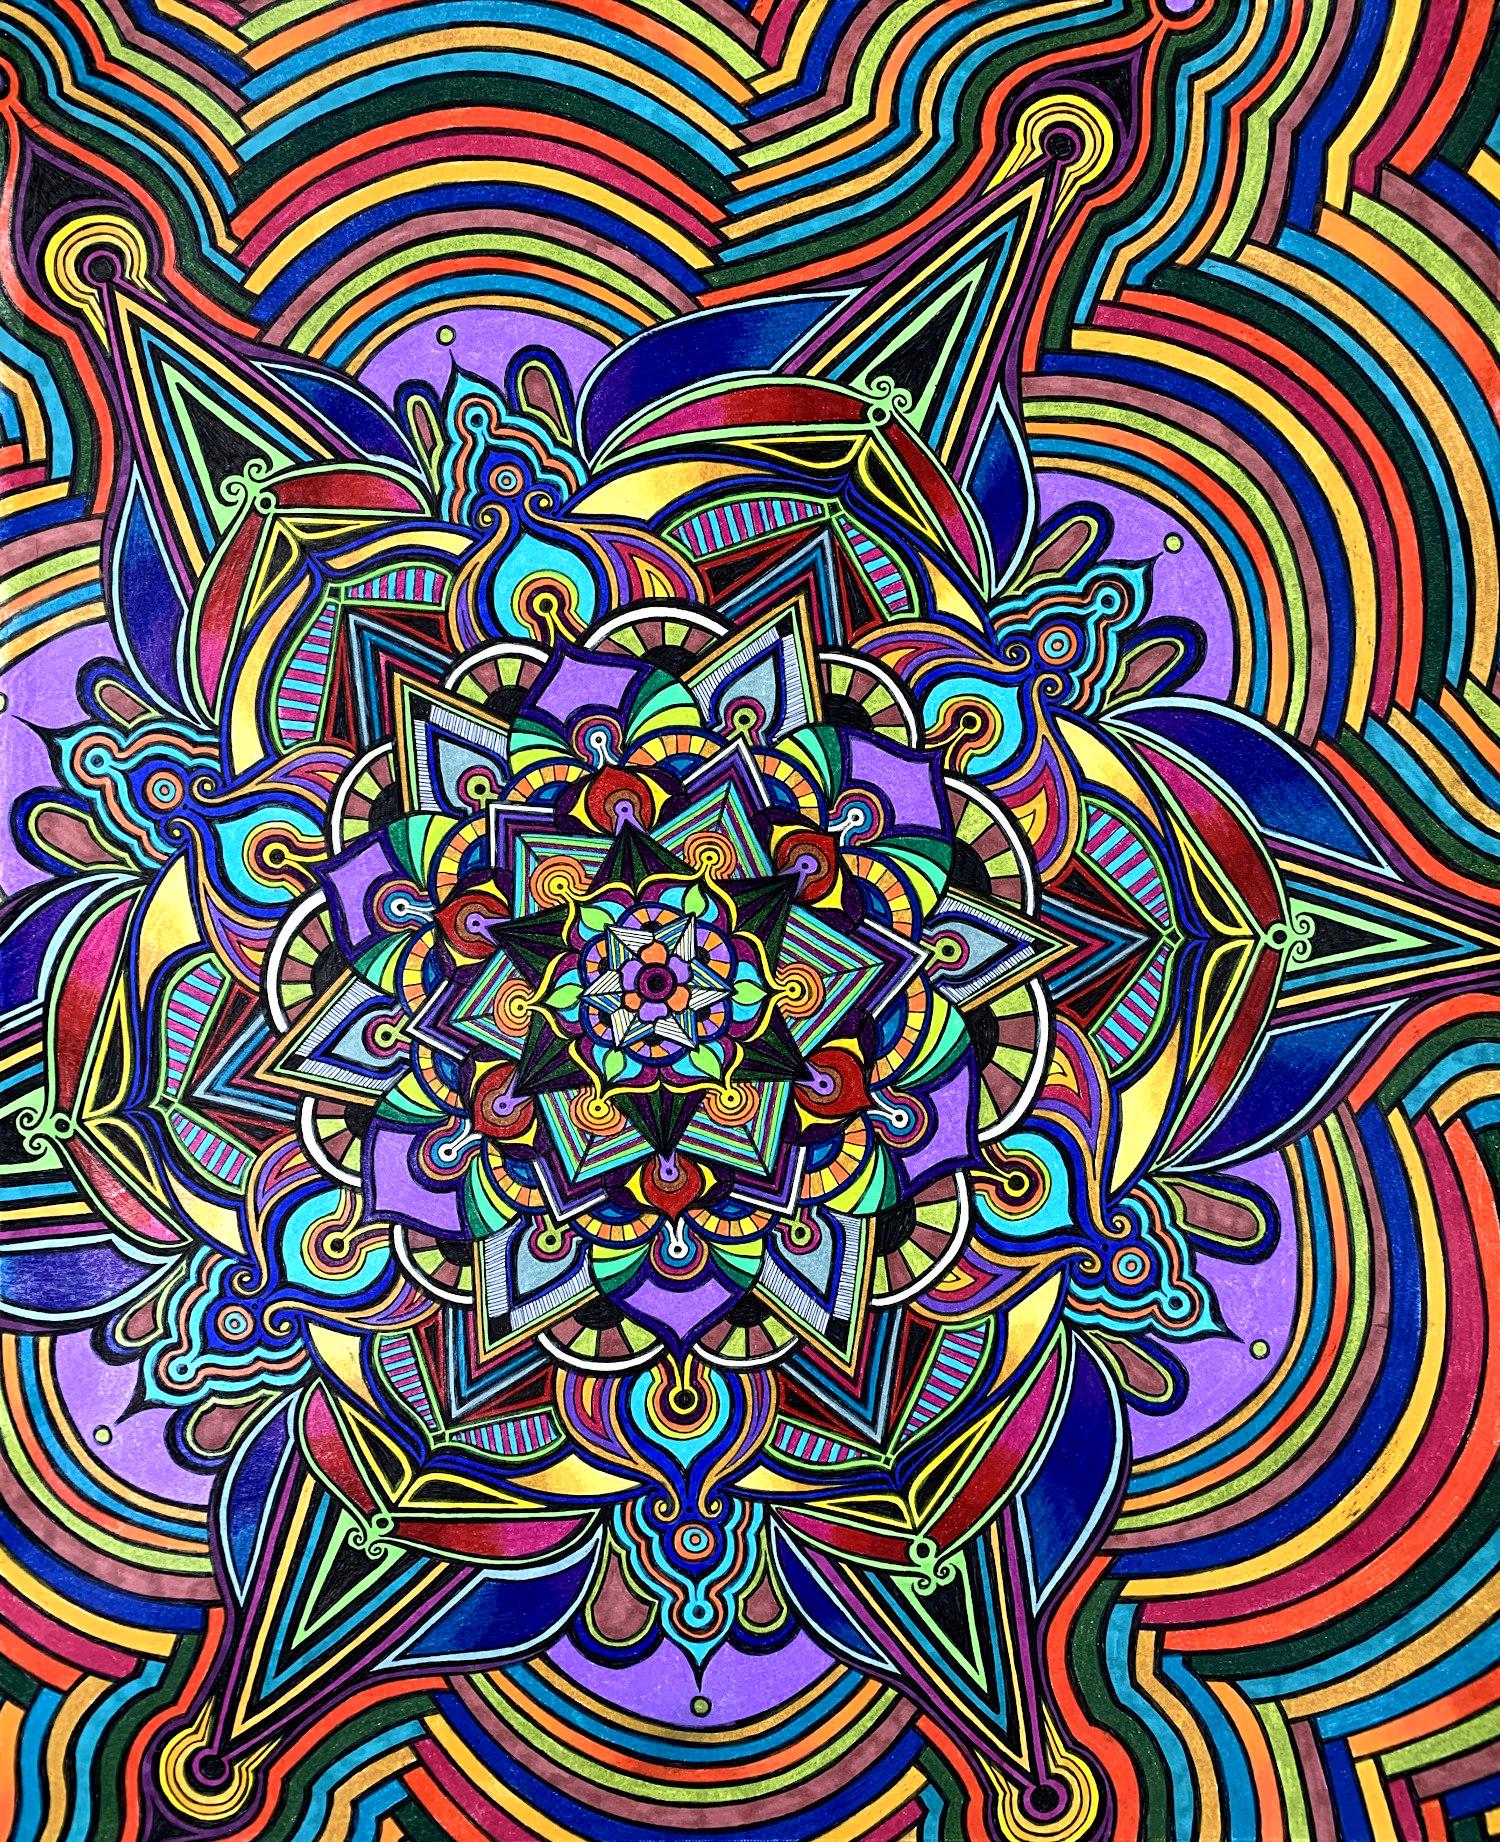 Flowers #9 drawing, by Tara Marolf